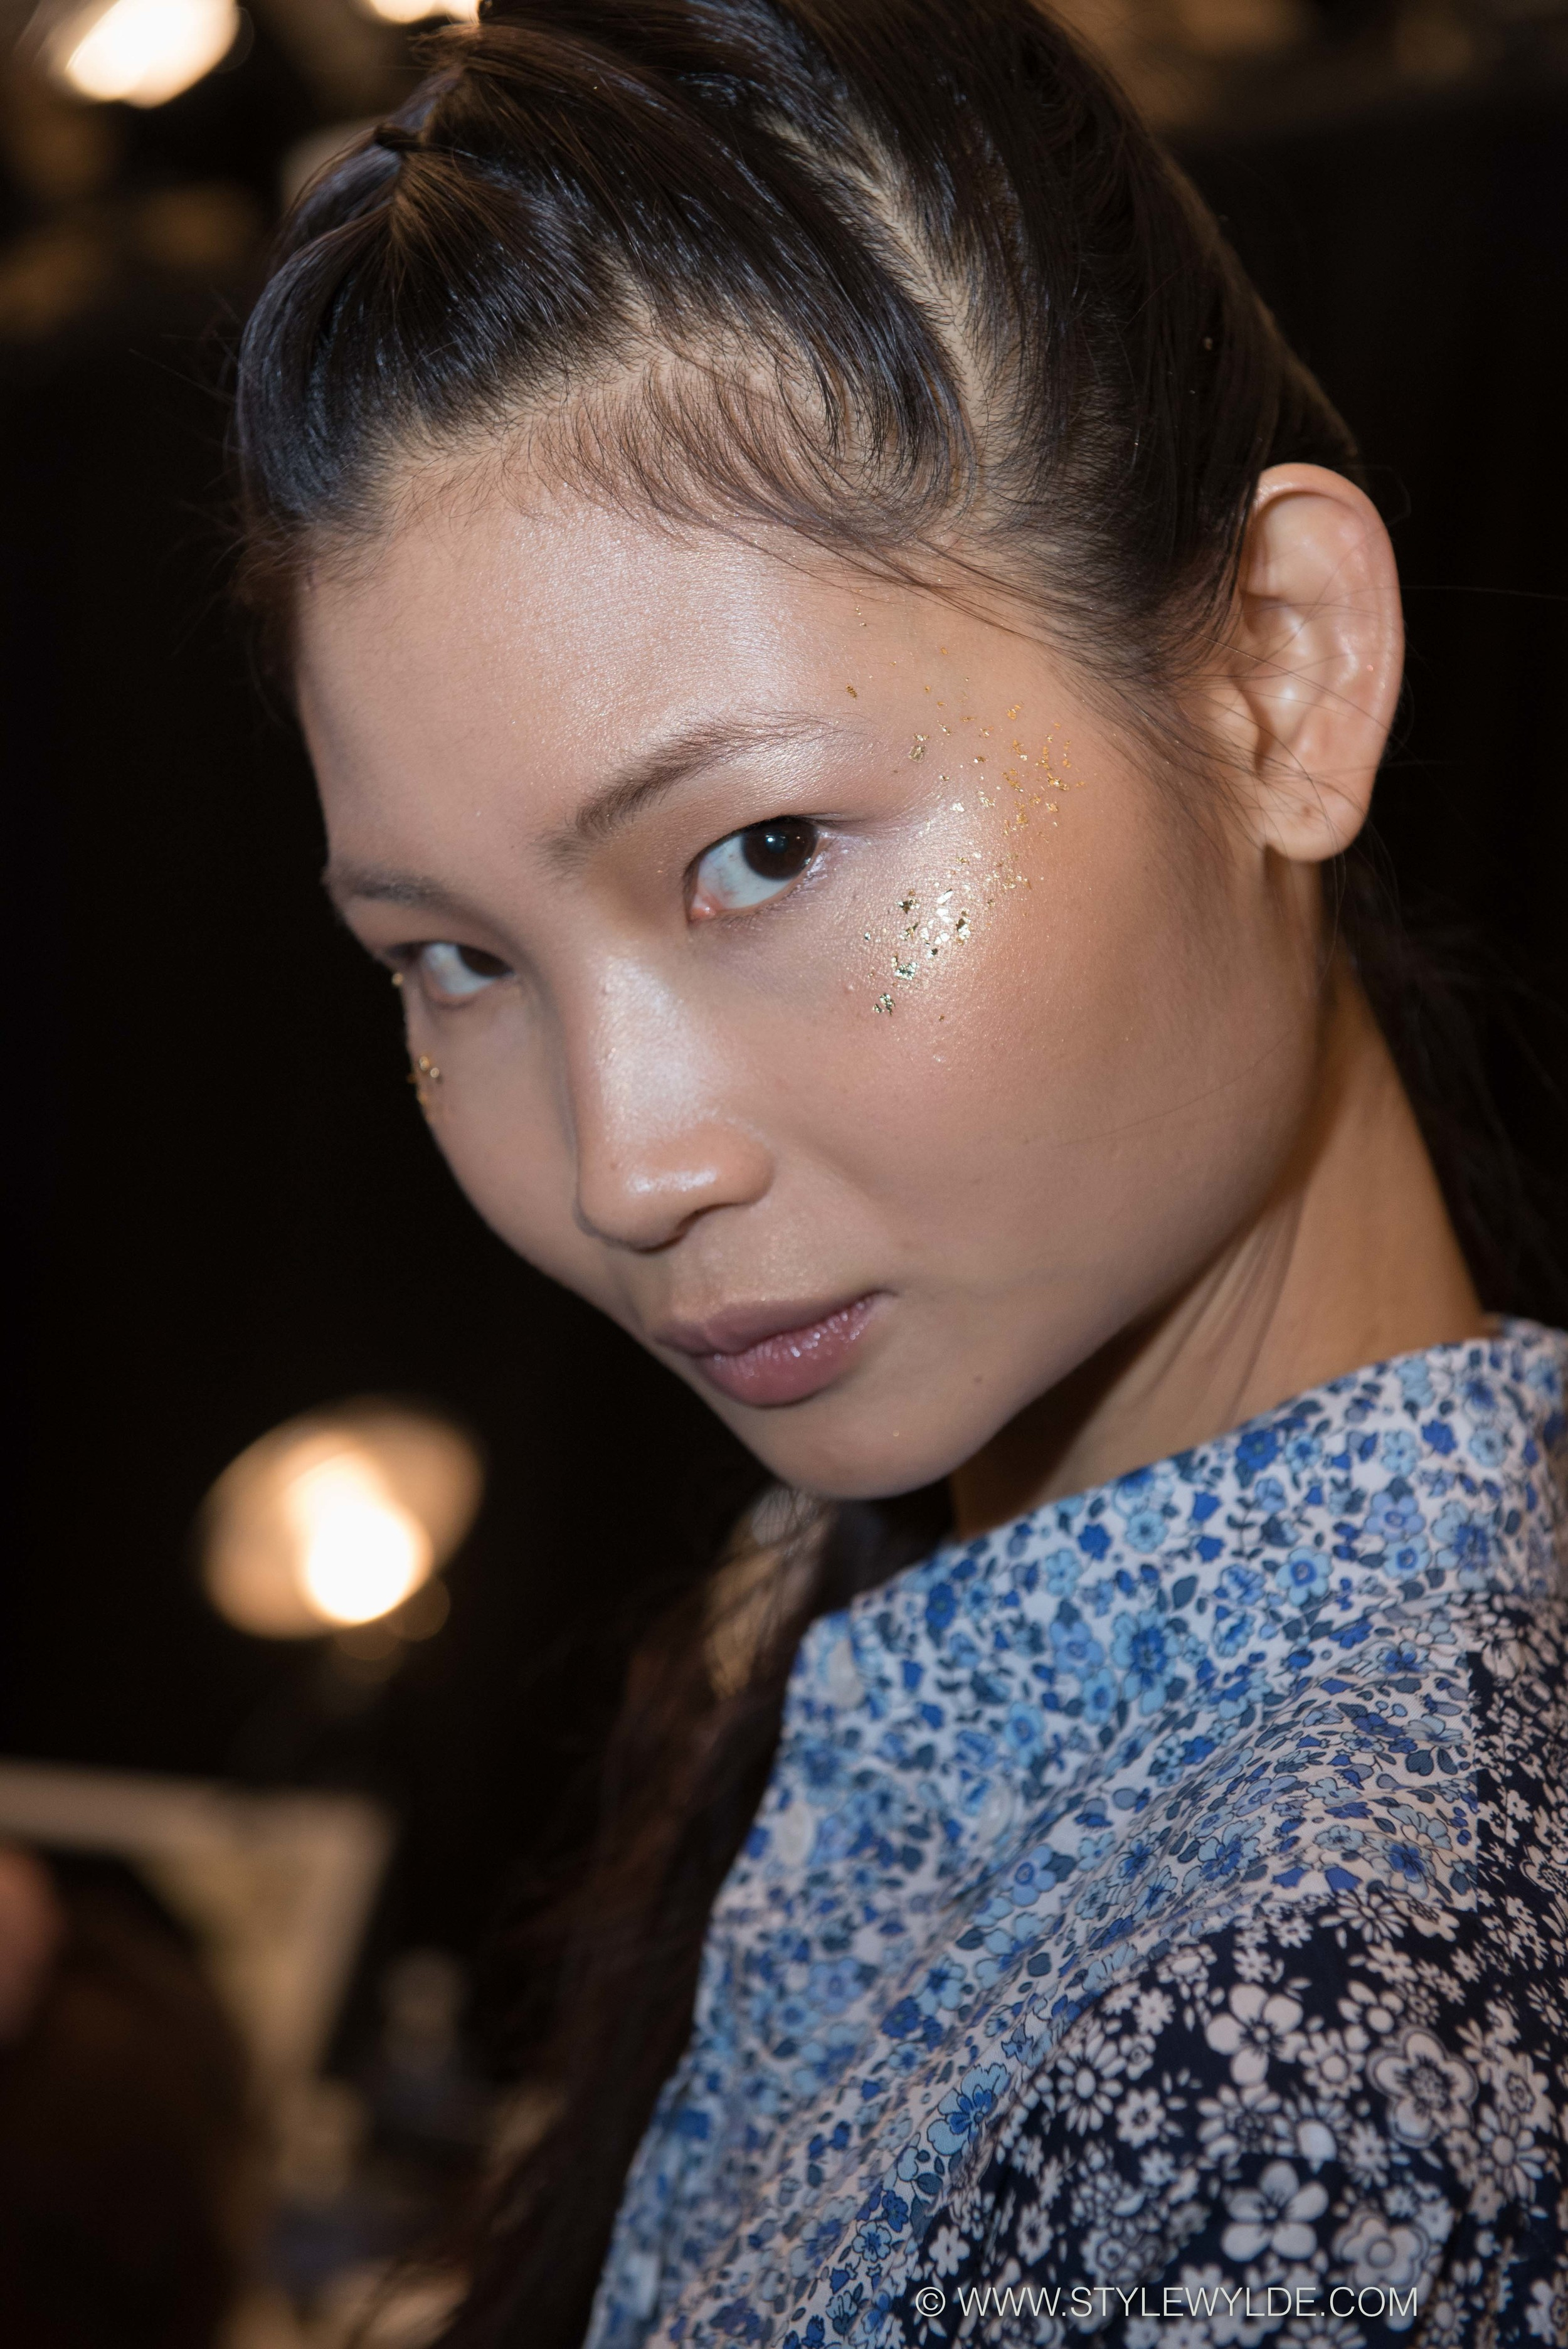 StyleWylde - HIromi Asai- Bkstg-8.jpg